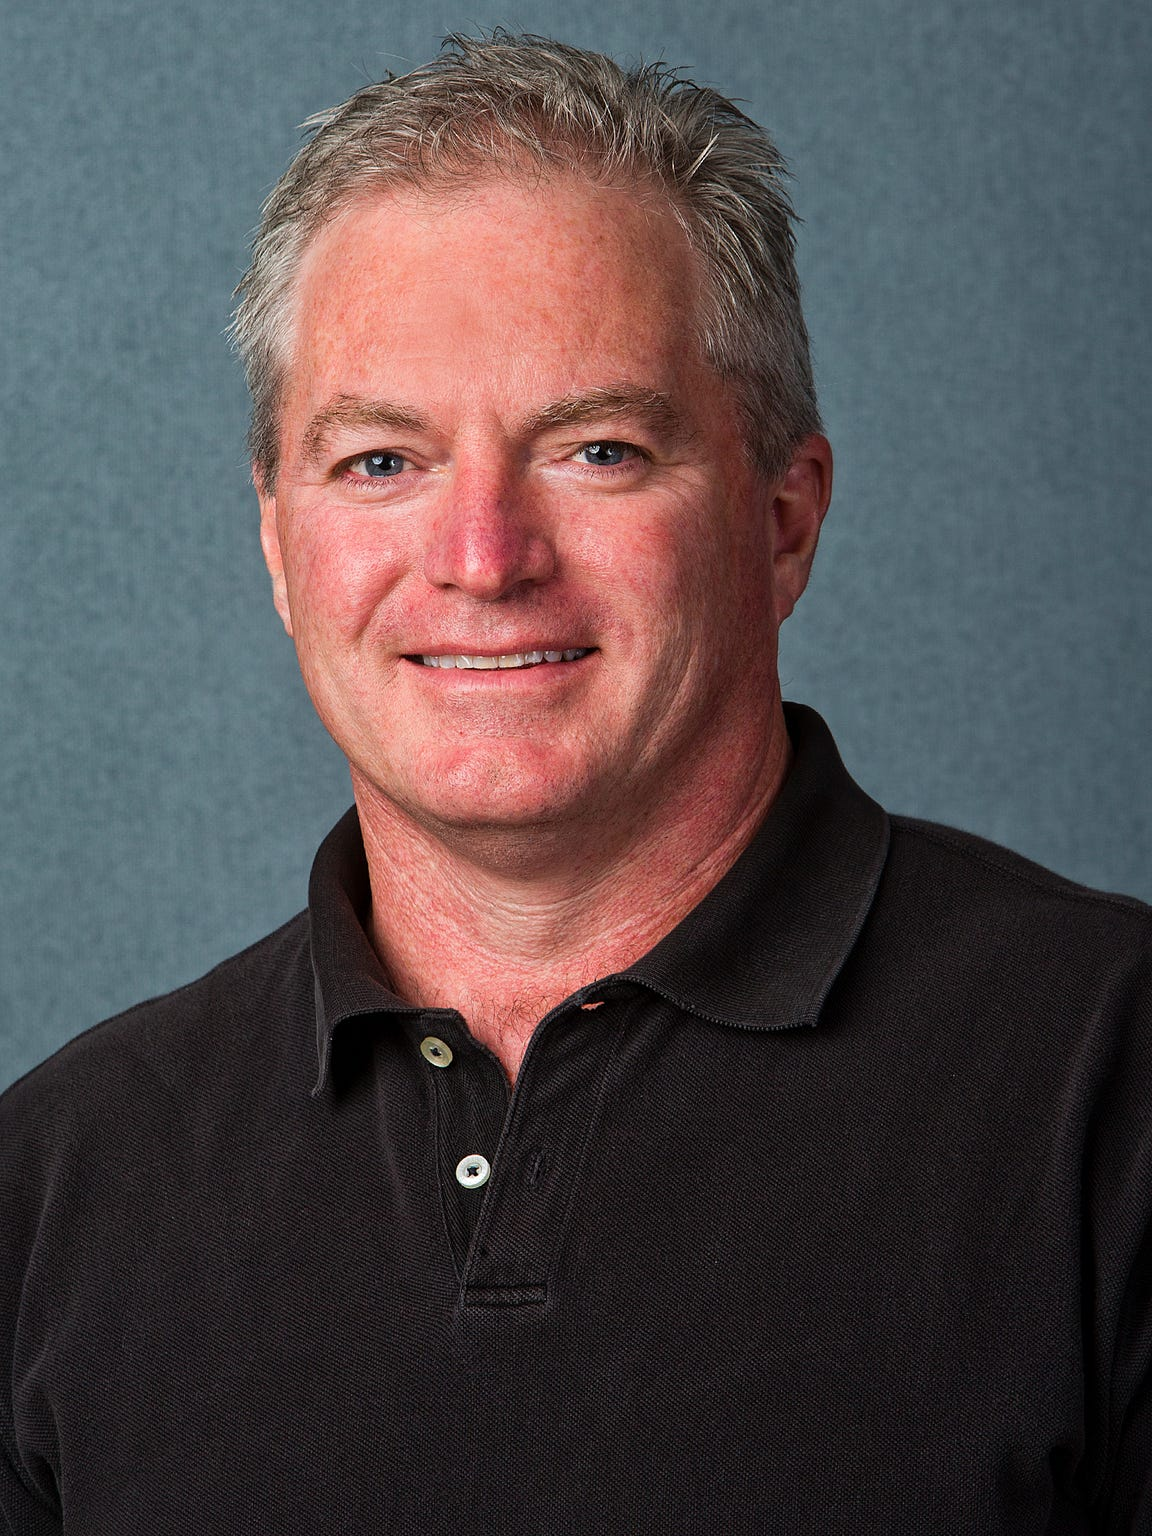 Paul Giblin